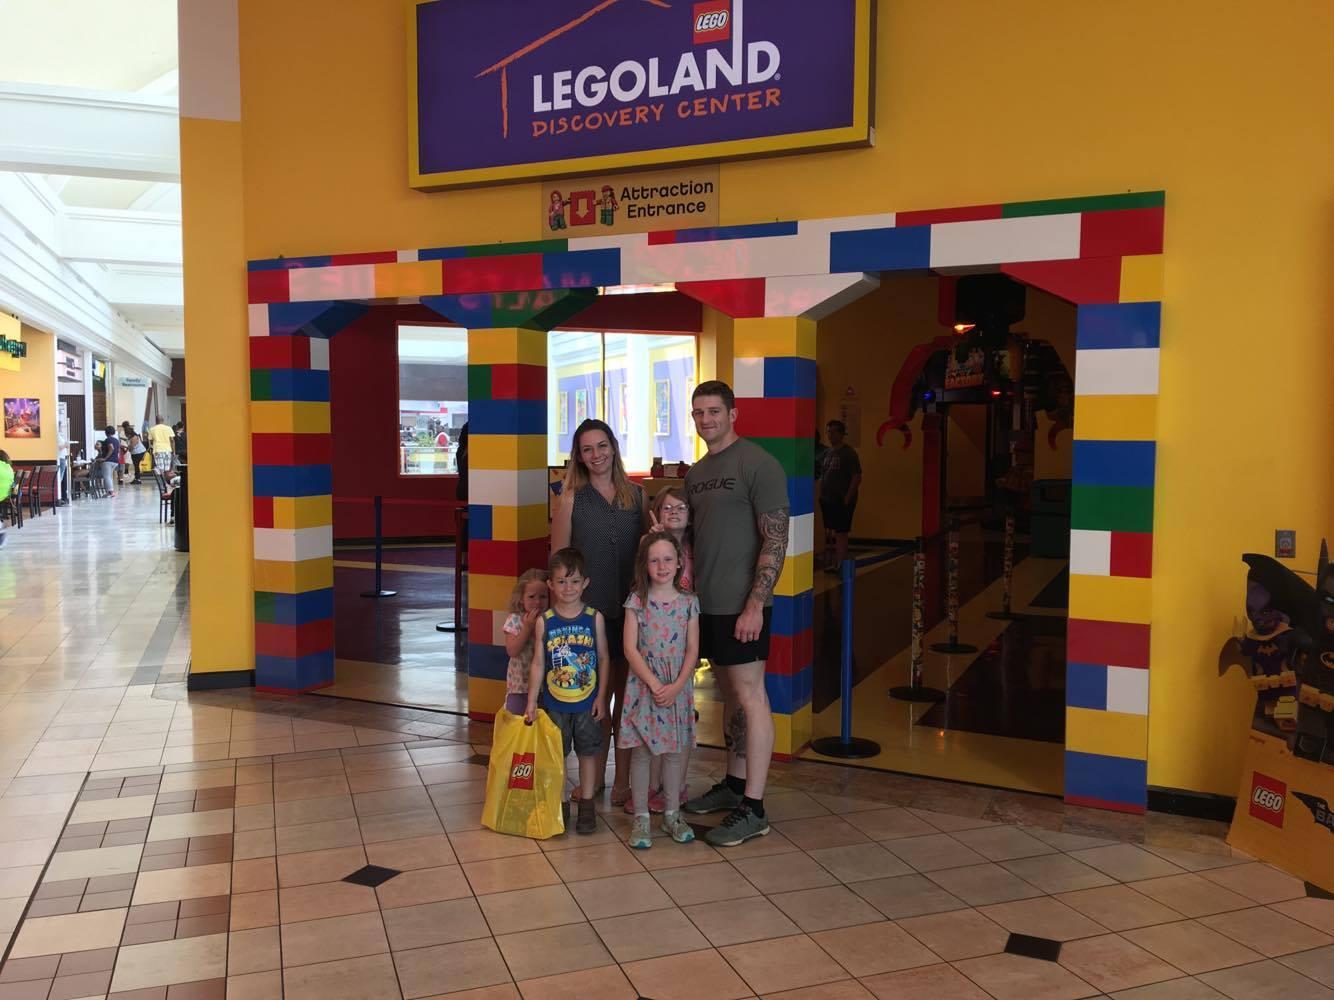 Legoland Discovery Center Atlanta: Summer Fun For Your Military family!